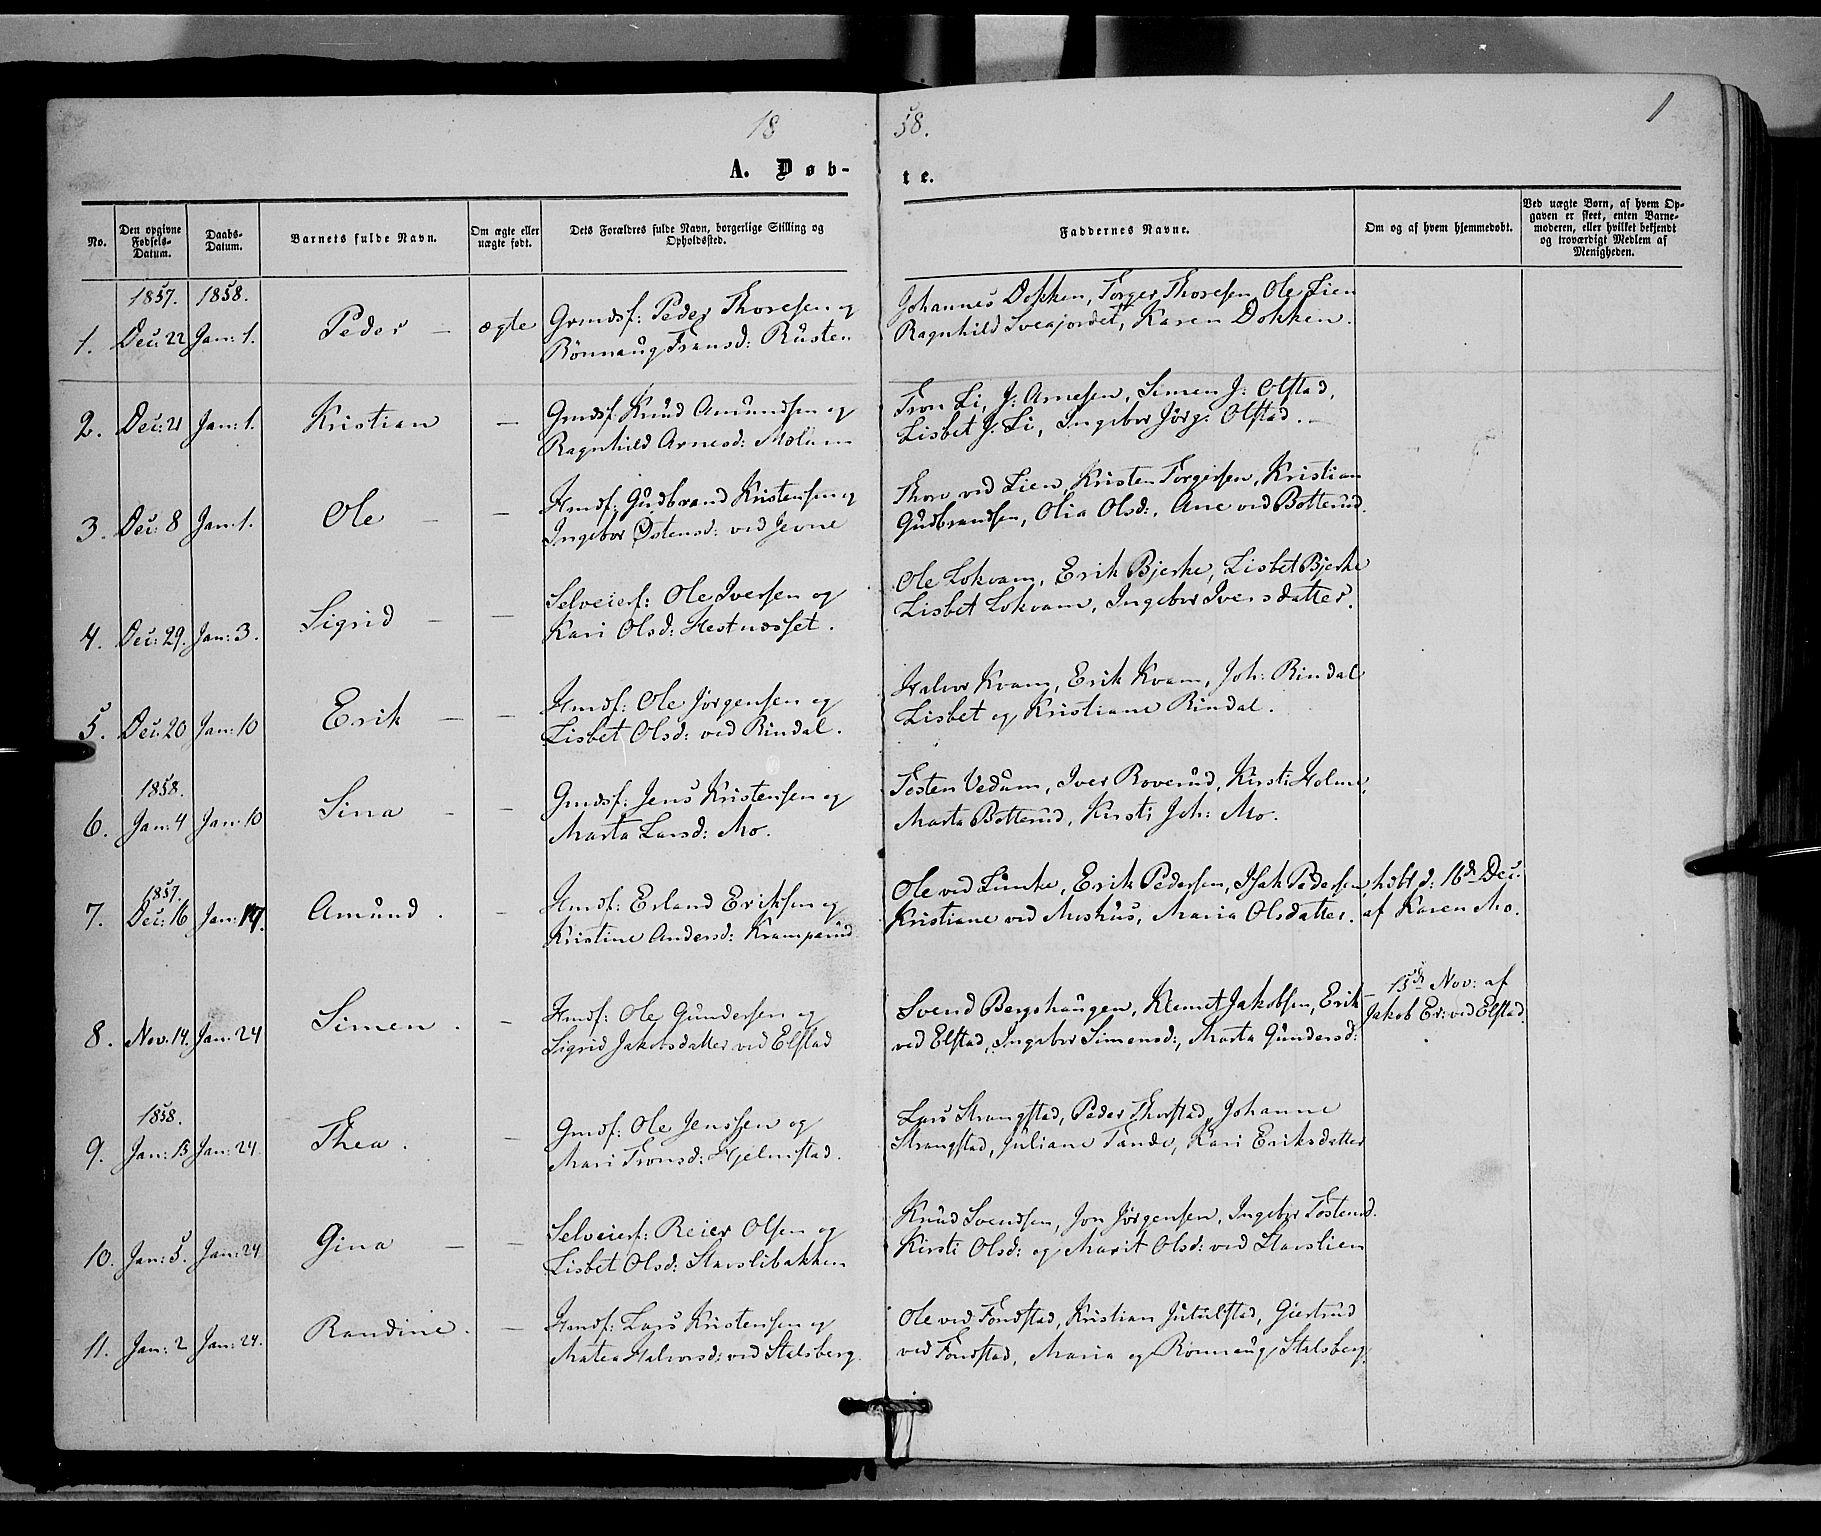 SAH, Øyer prestekontor, Ministerialbok nr. 6, 1858-1874, s. 1